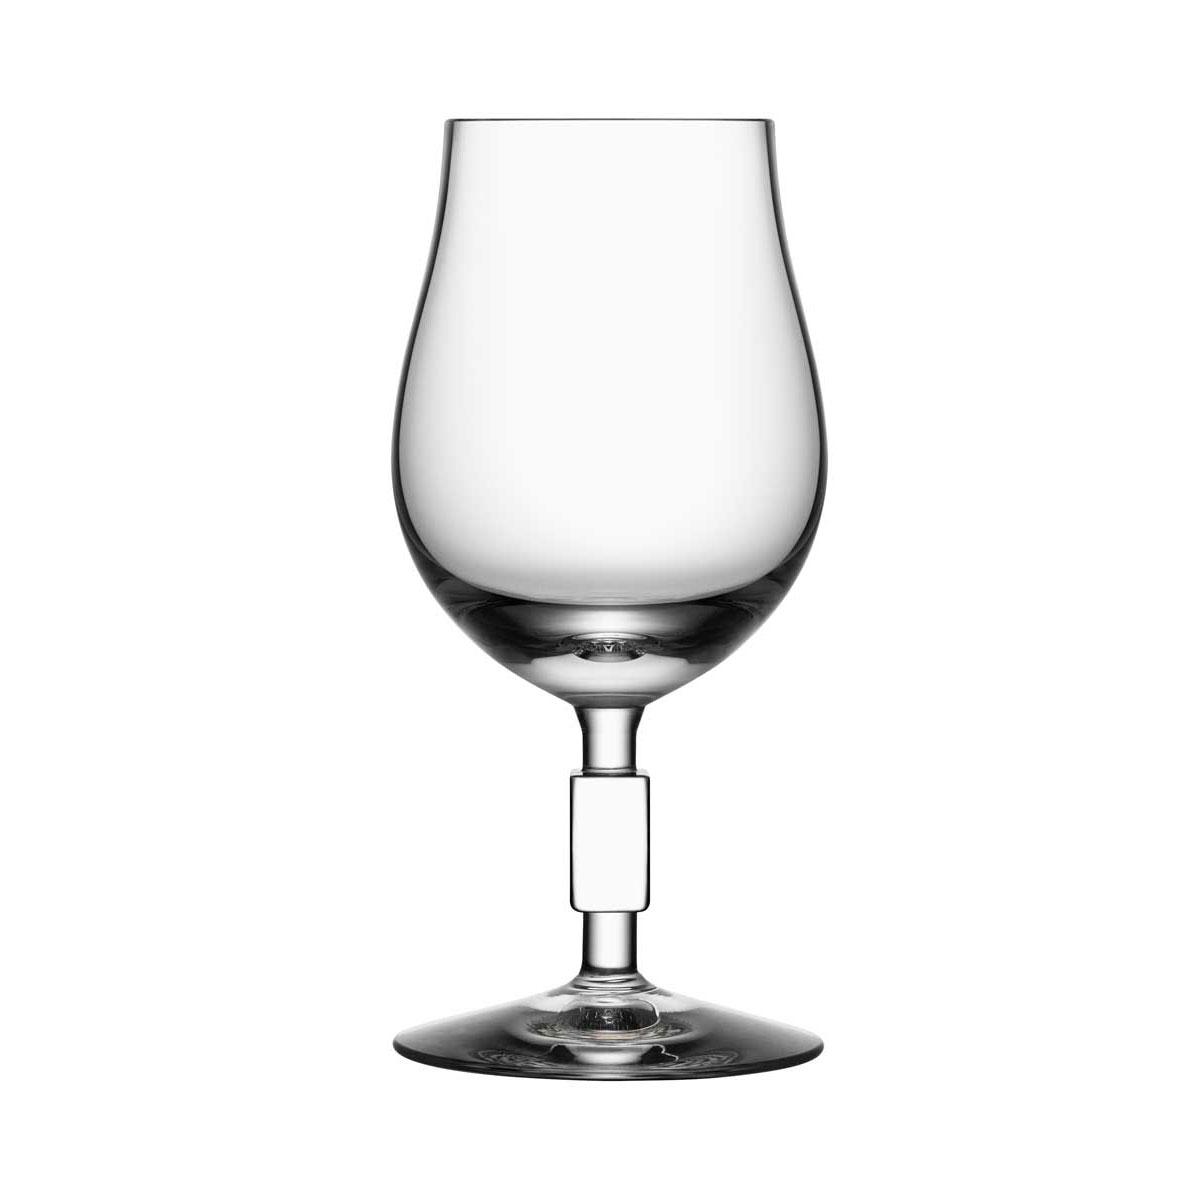 Orrefors Crystal, Unique Cognac, Single